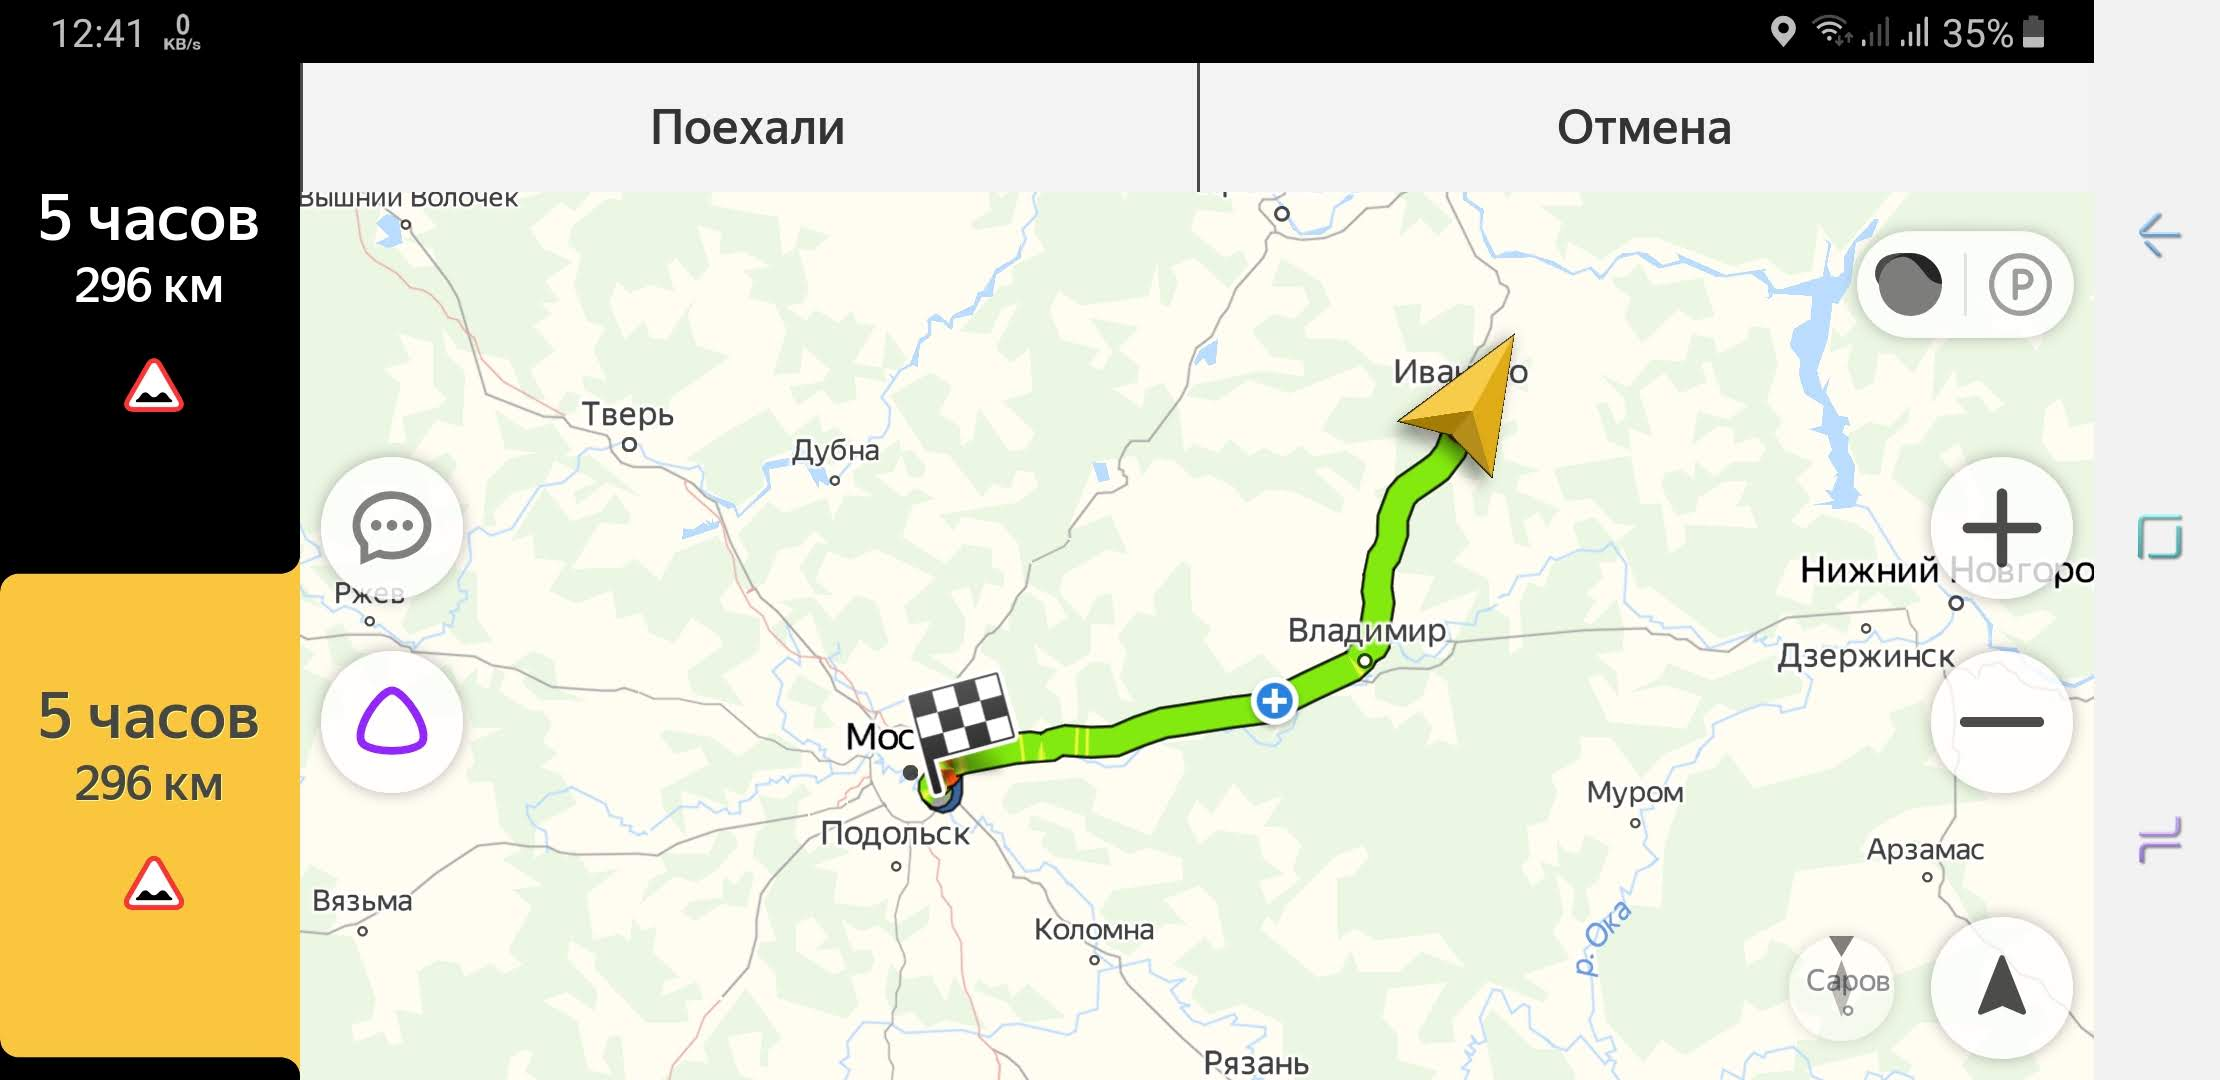 Яндекс.Навигатор для смартфона